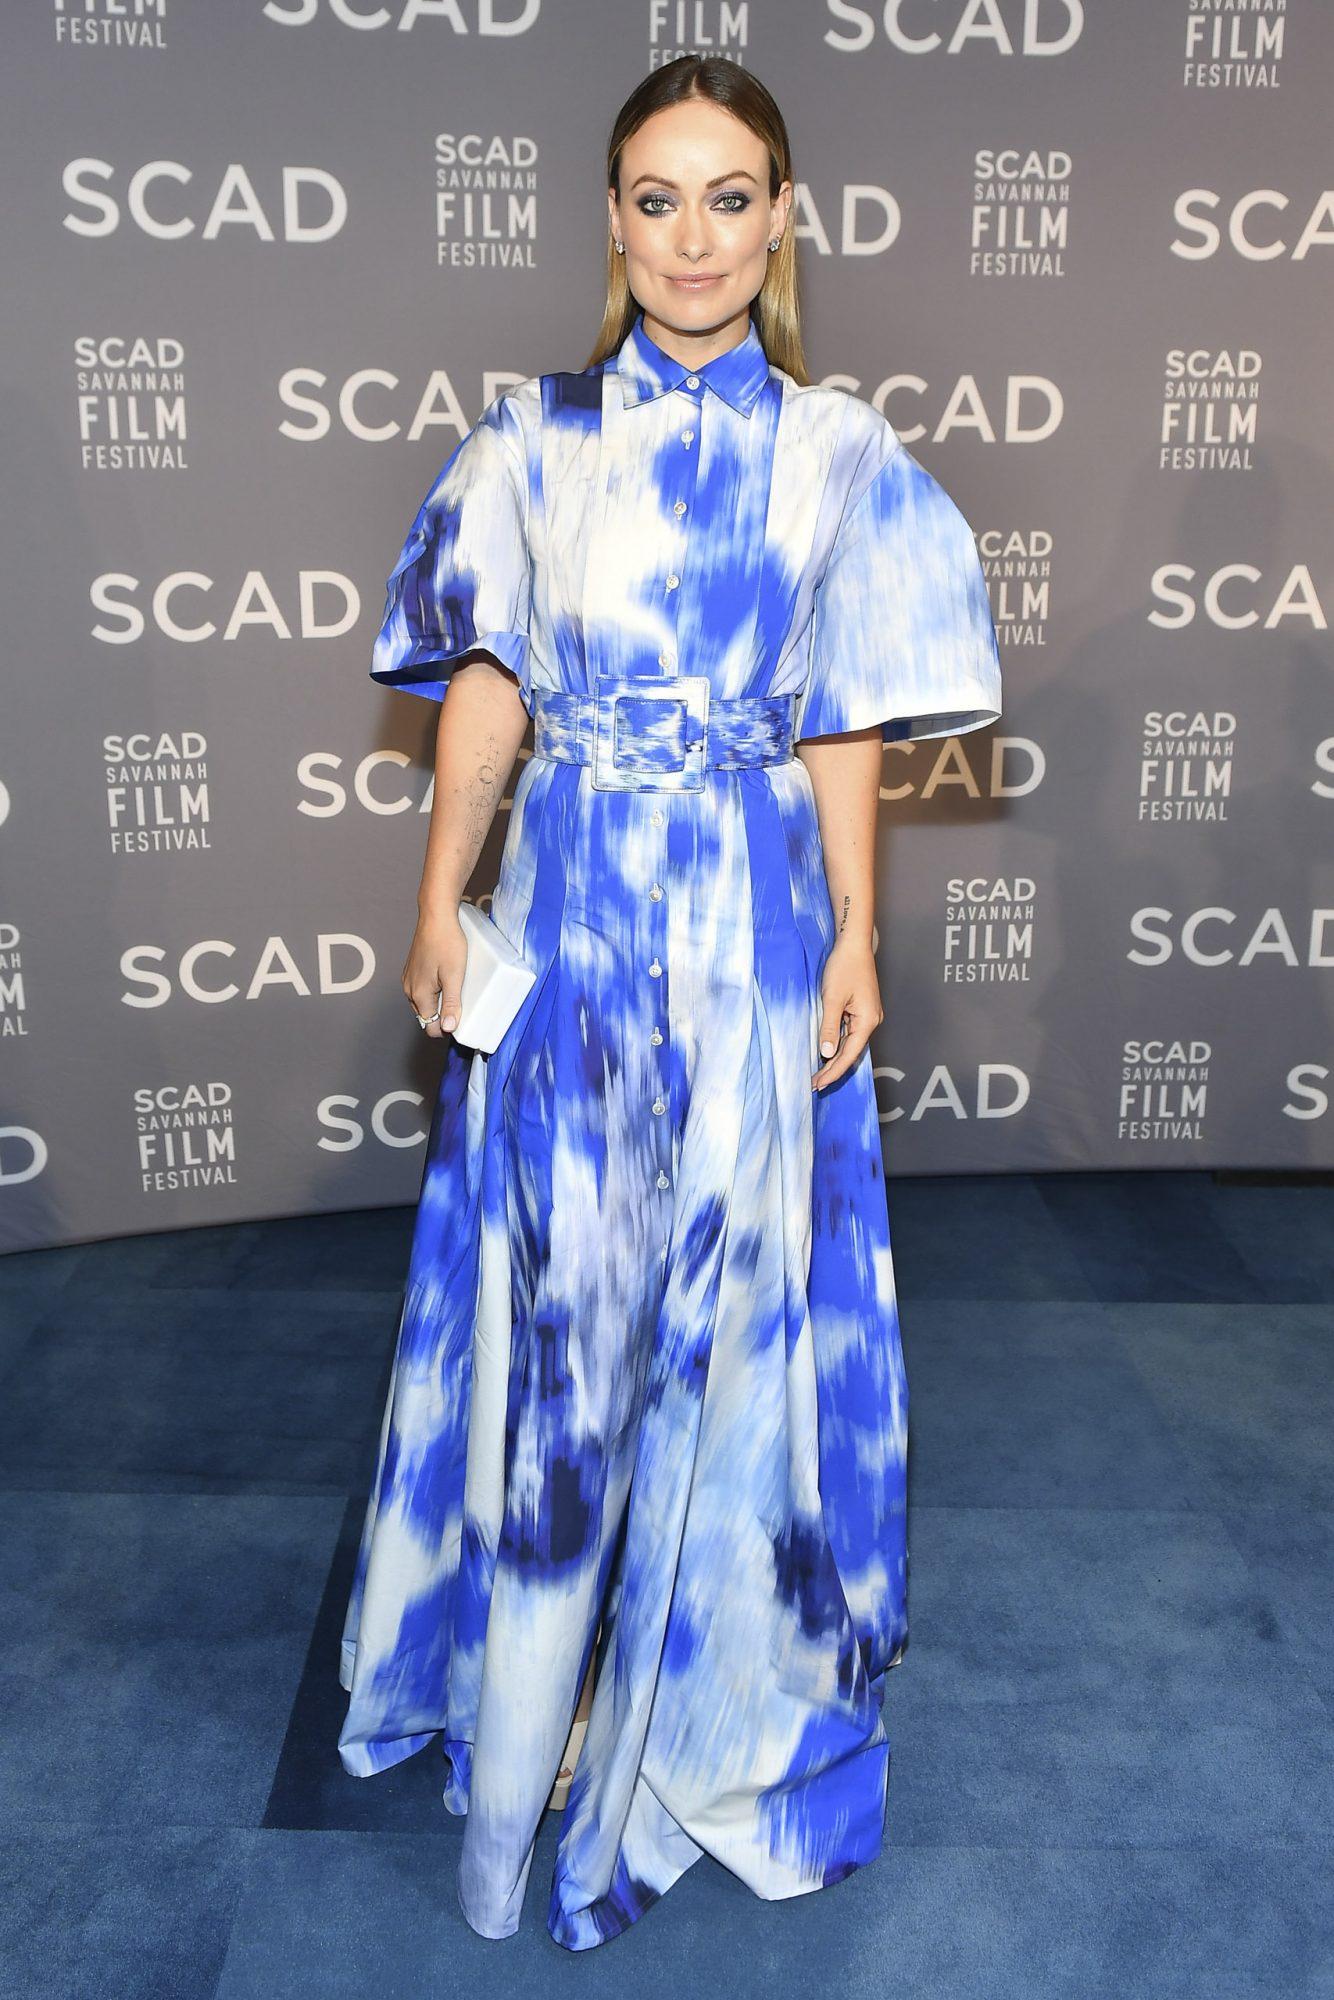 2019 SCAD Savannah Film Festival